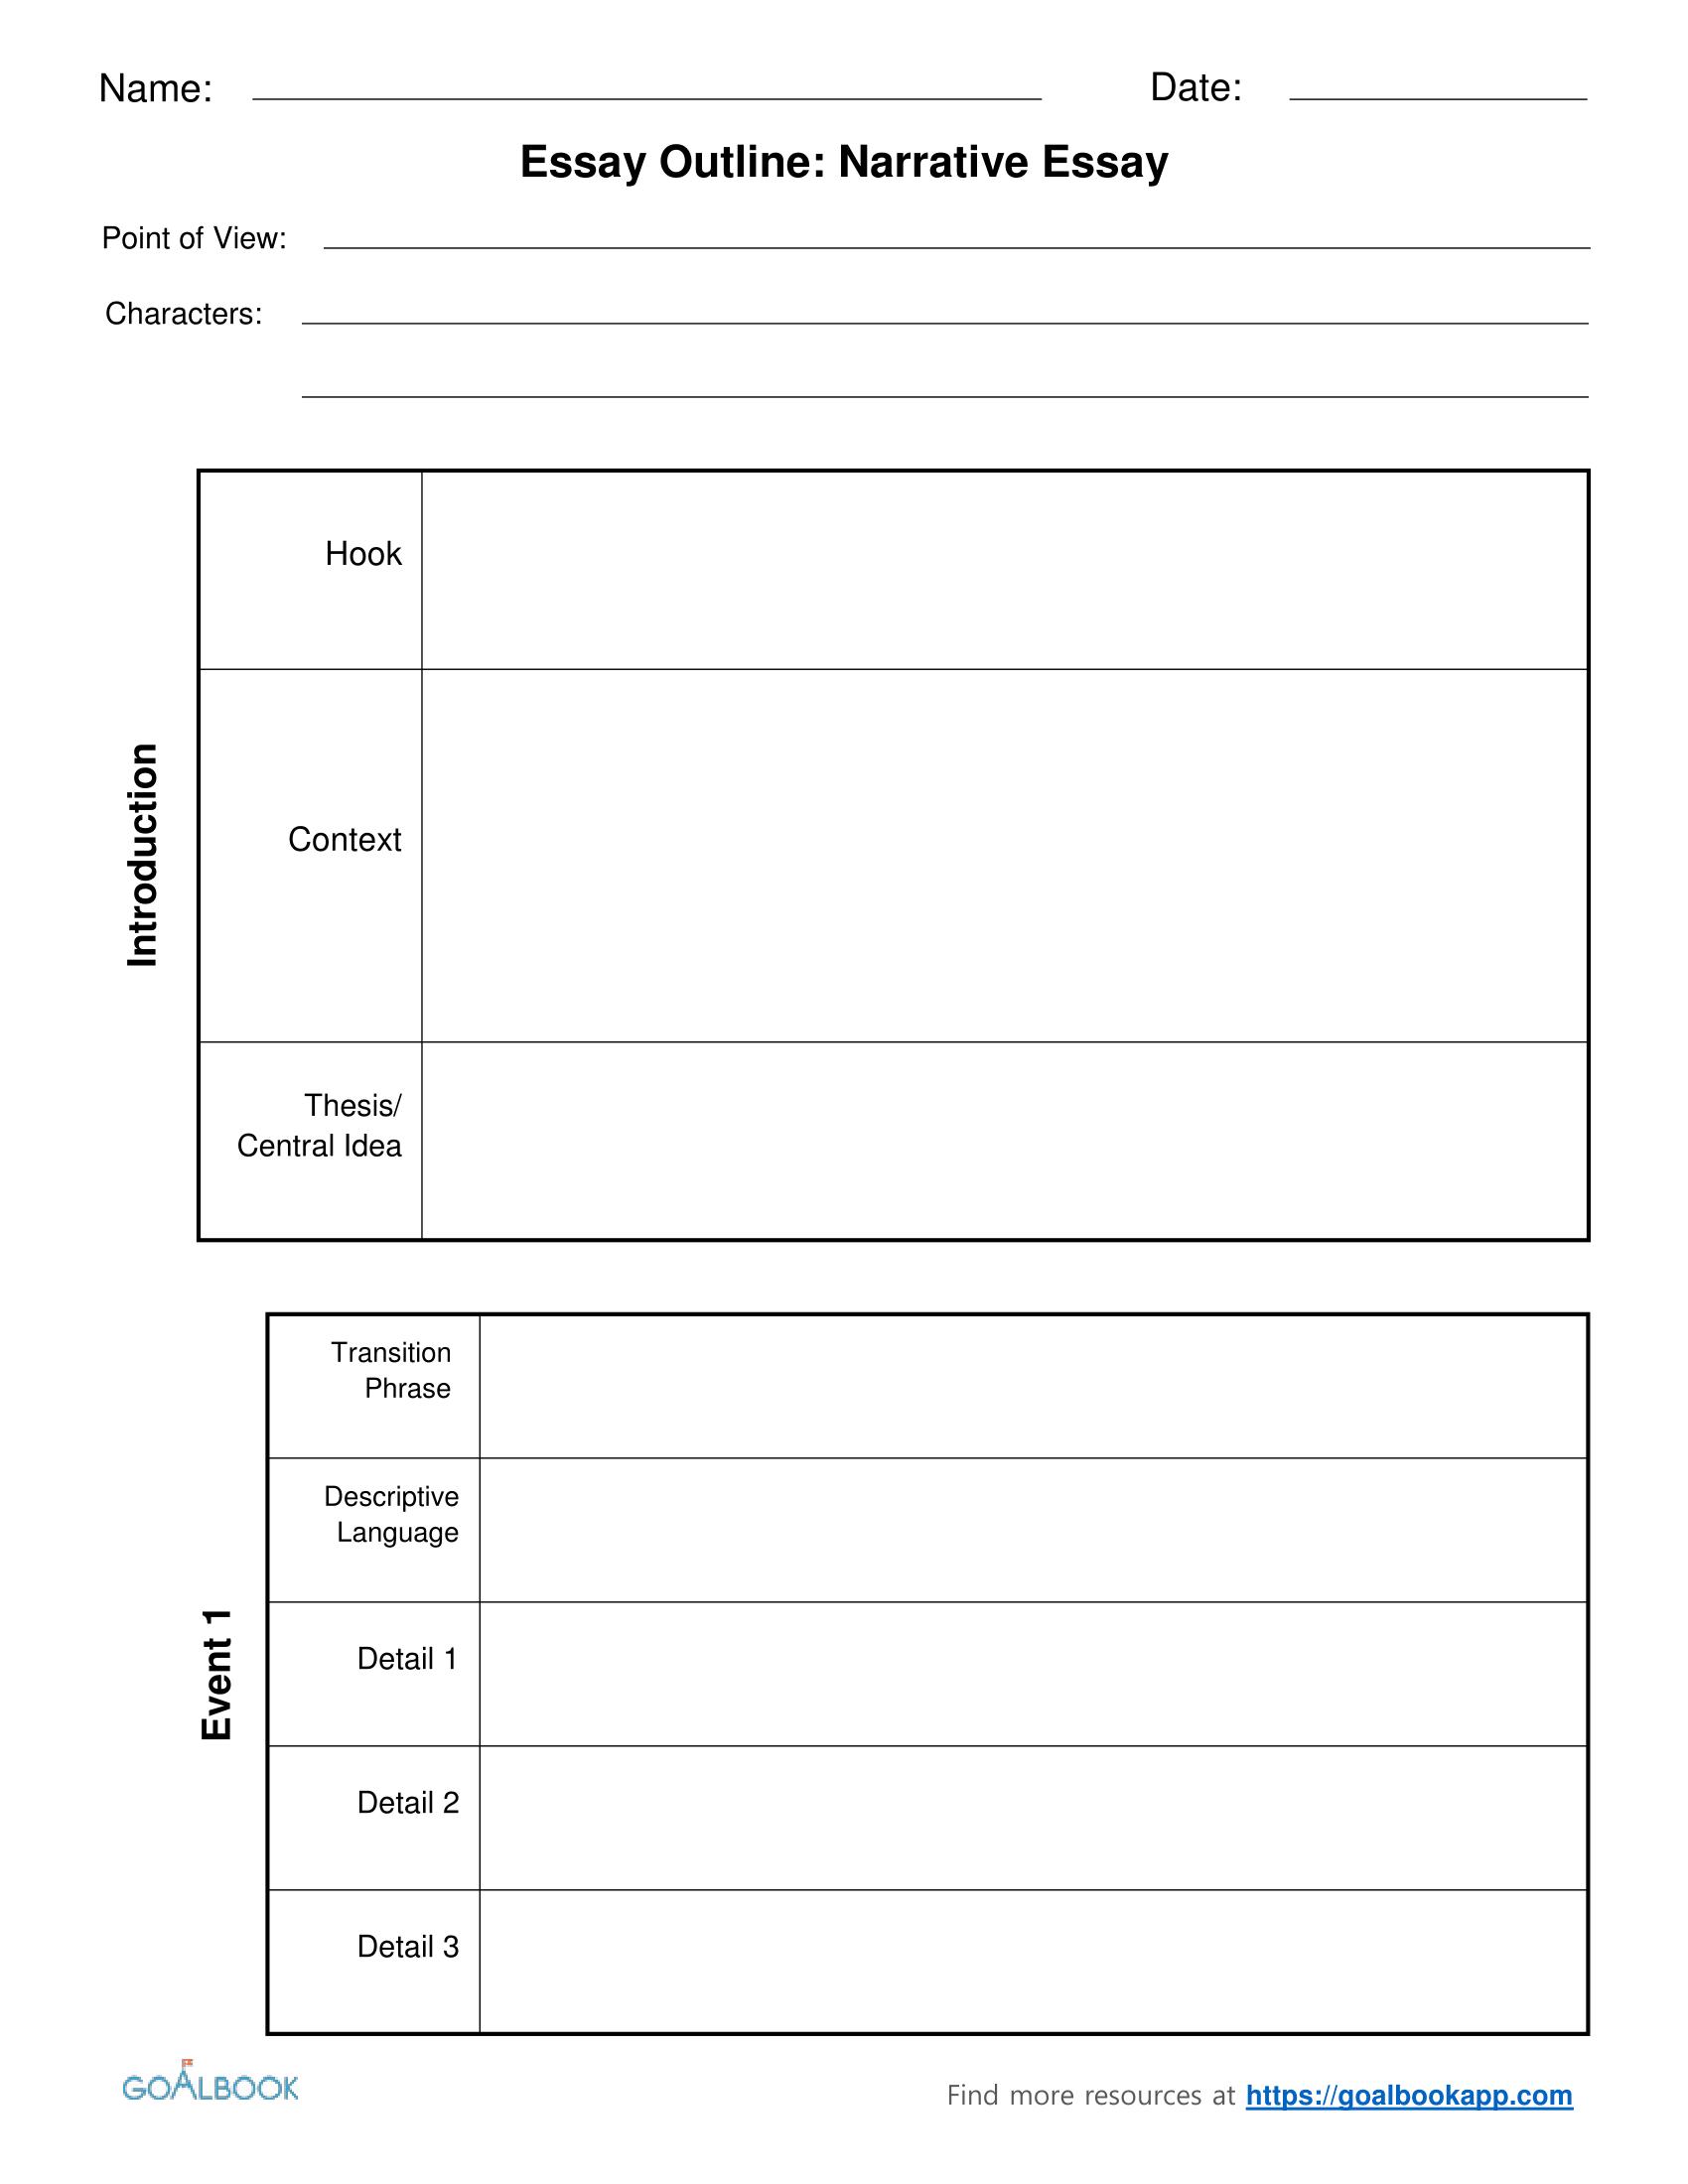 005 Essay Example Informative Graphic Organizer 4narrativeessayoutlinechunked Fascinating Free Informational Pdf 6th Grade Full